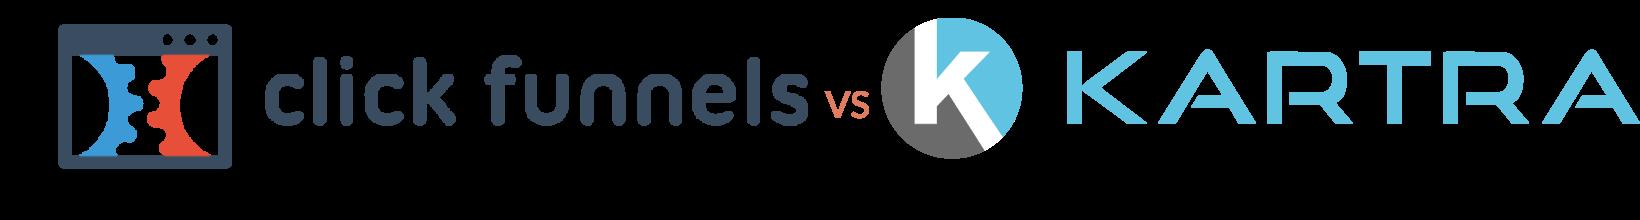 clickfunnels-vs-kartra